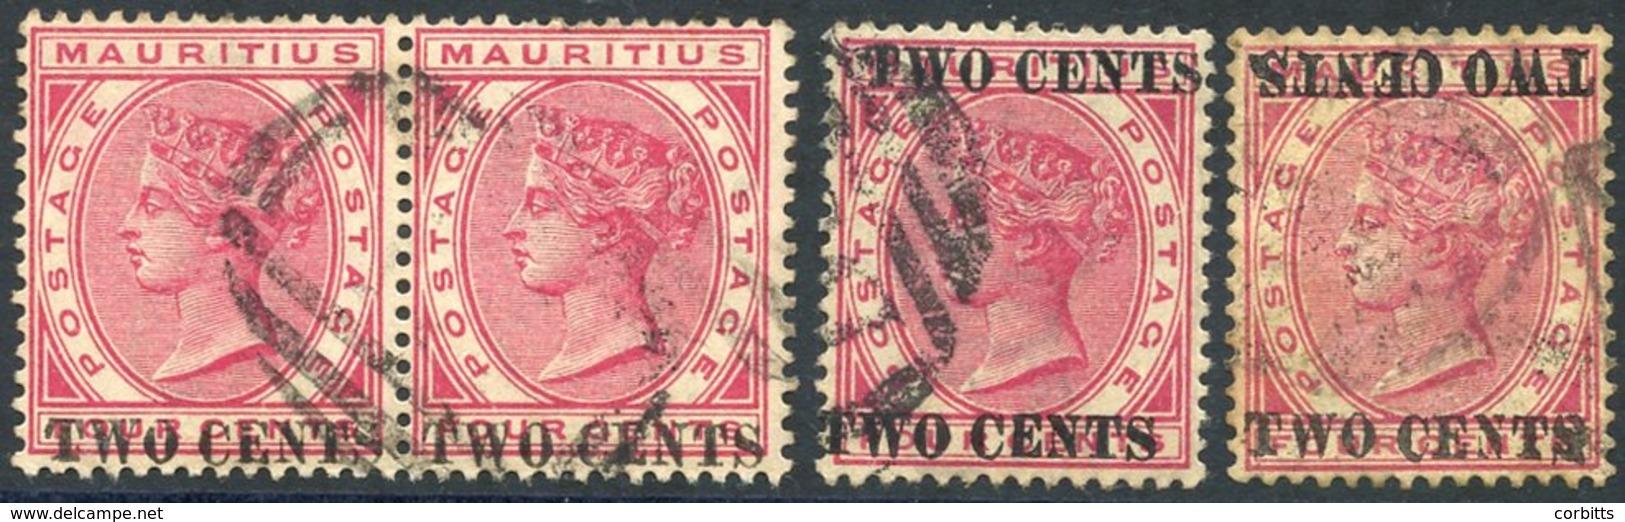 1891 2c On 4c Carmine, VFU Pair, SG.118, Single Optd Double, Another Optd Double One Inverted, Good U, SG.118/a/c. (4) C - Non Classés